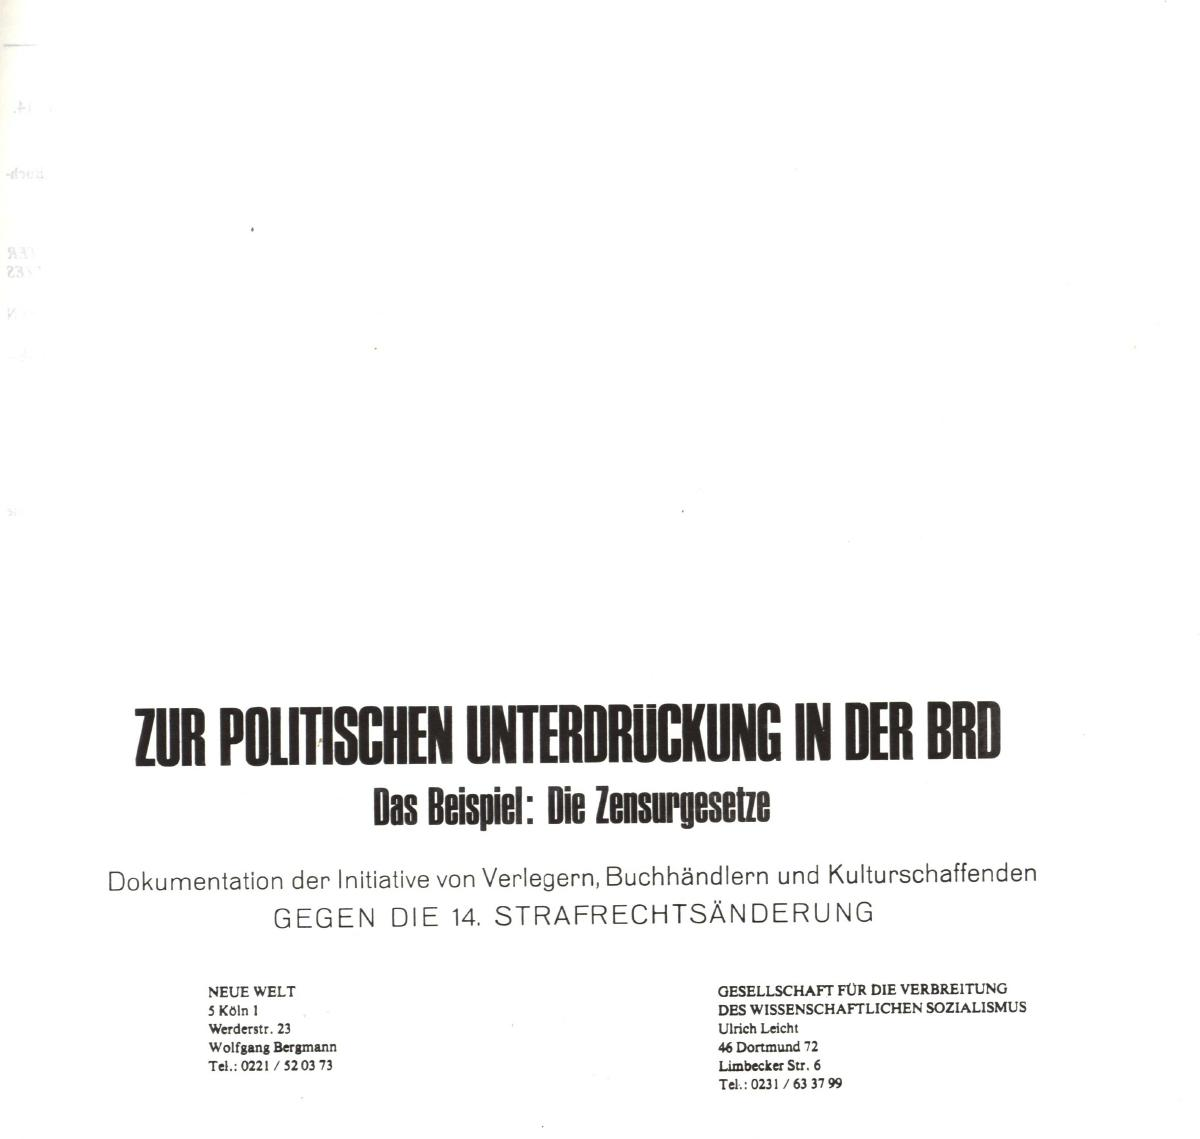 REP_VLB_1976_Die_Zensurgesetze_02